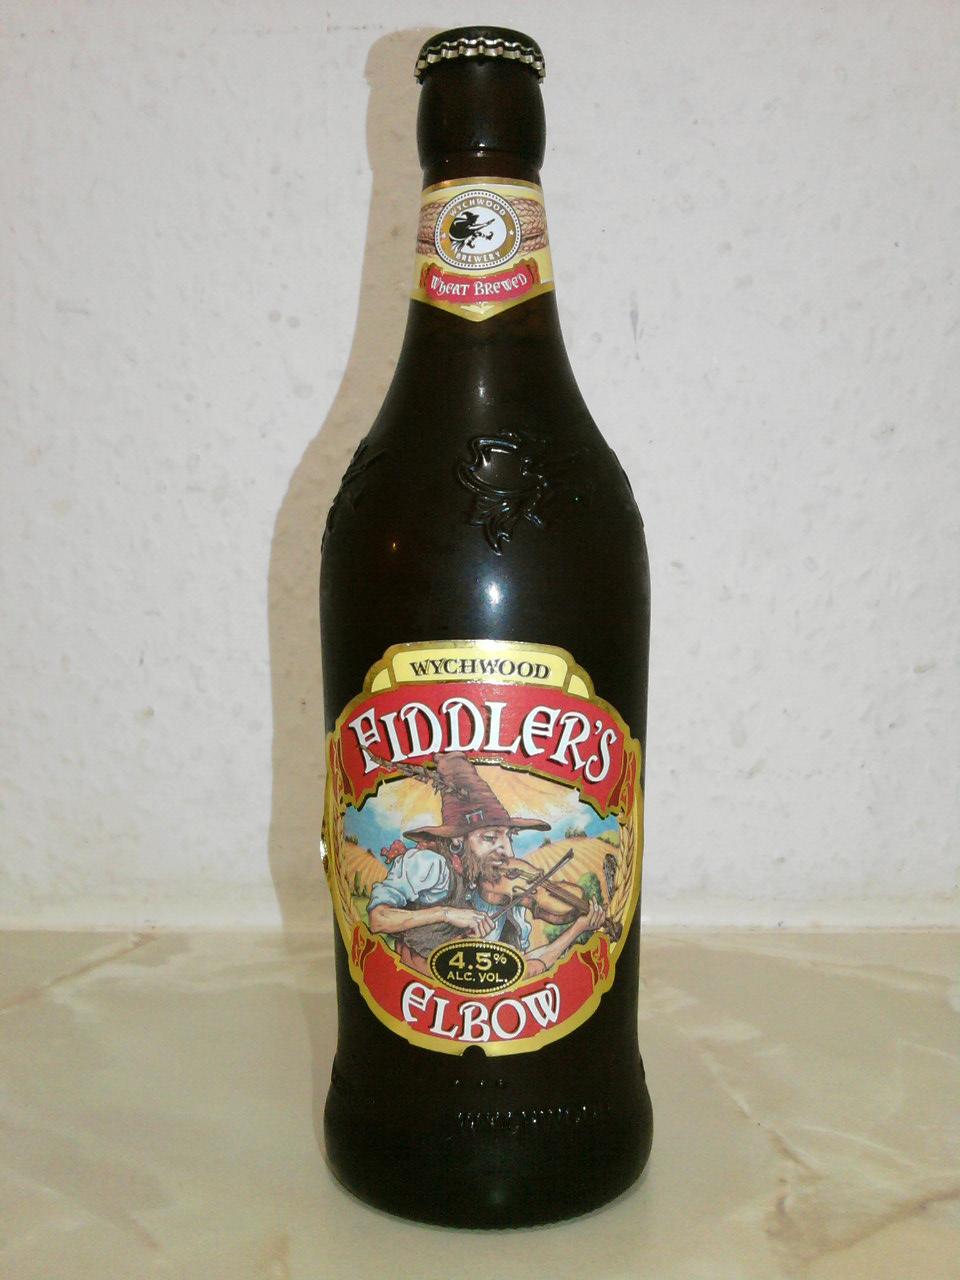 Wychwood Fiddler's Elbow bottle